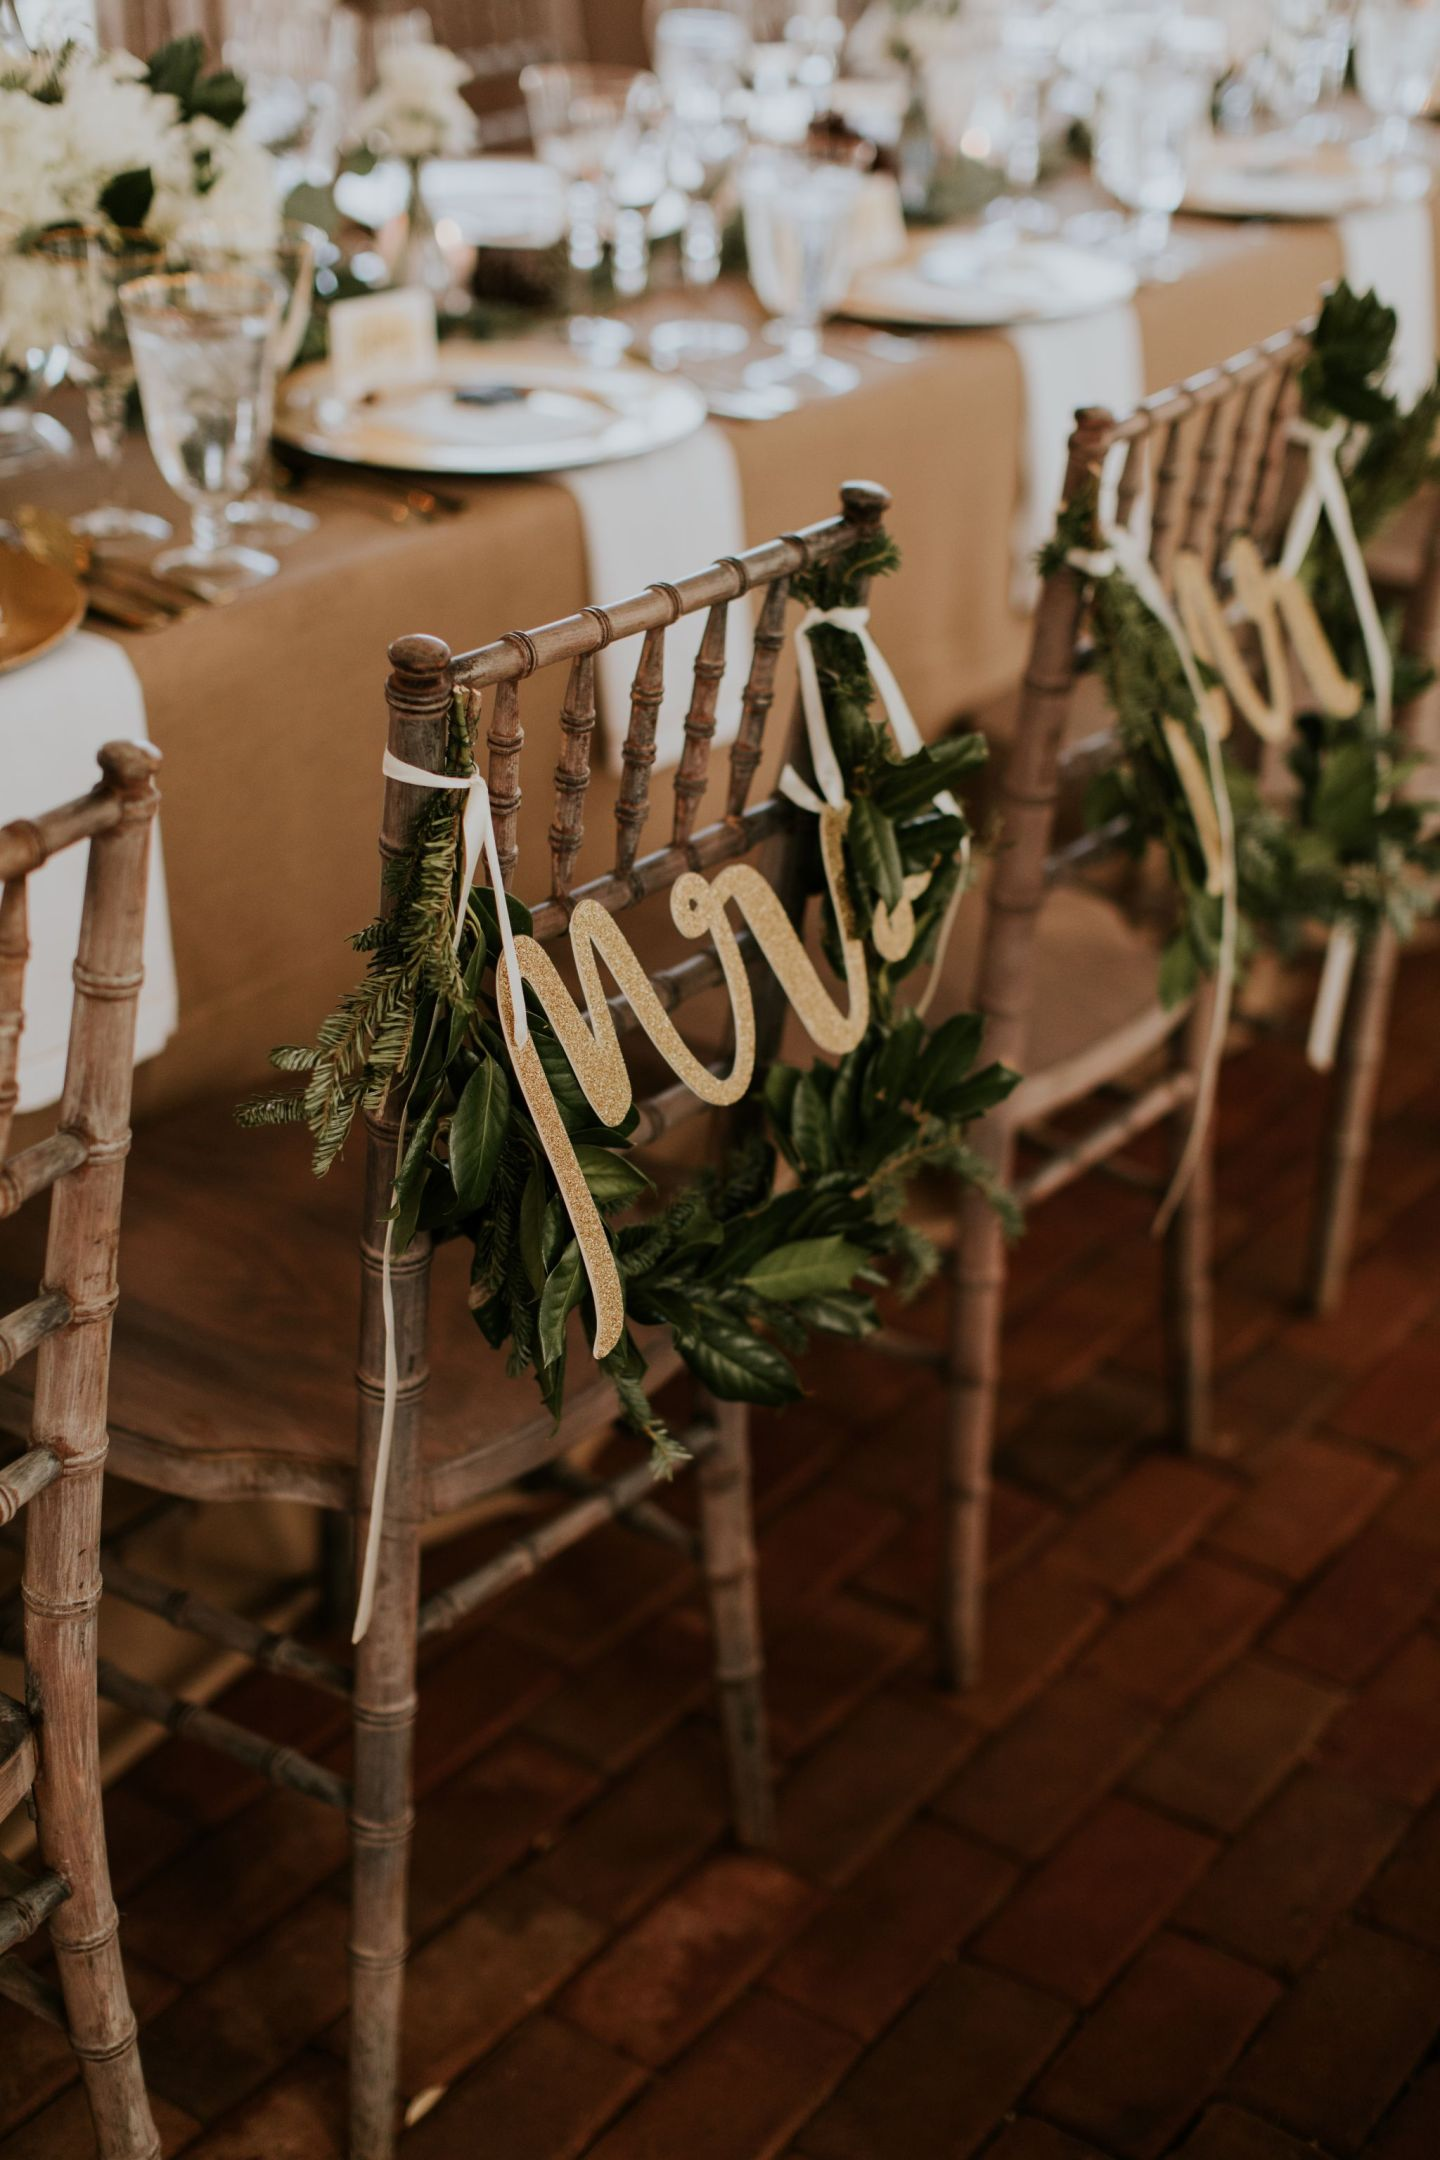 winter wedding flowers - evergreen swag wedding - evergreen garland wedding - mr. and mrs. signs